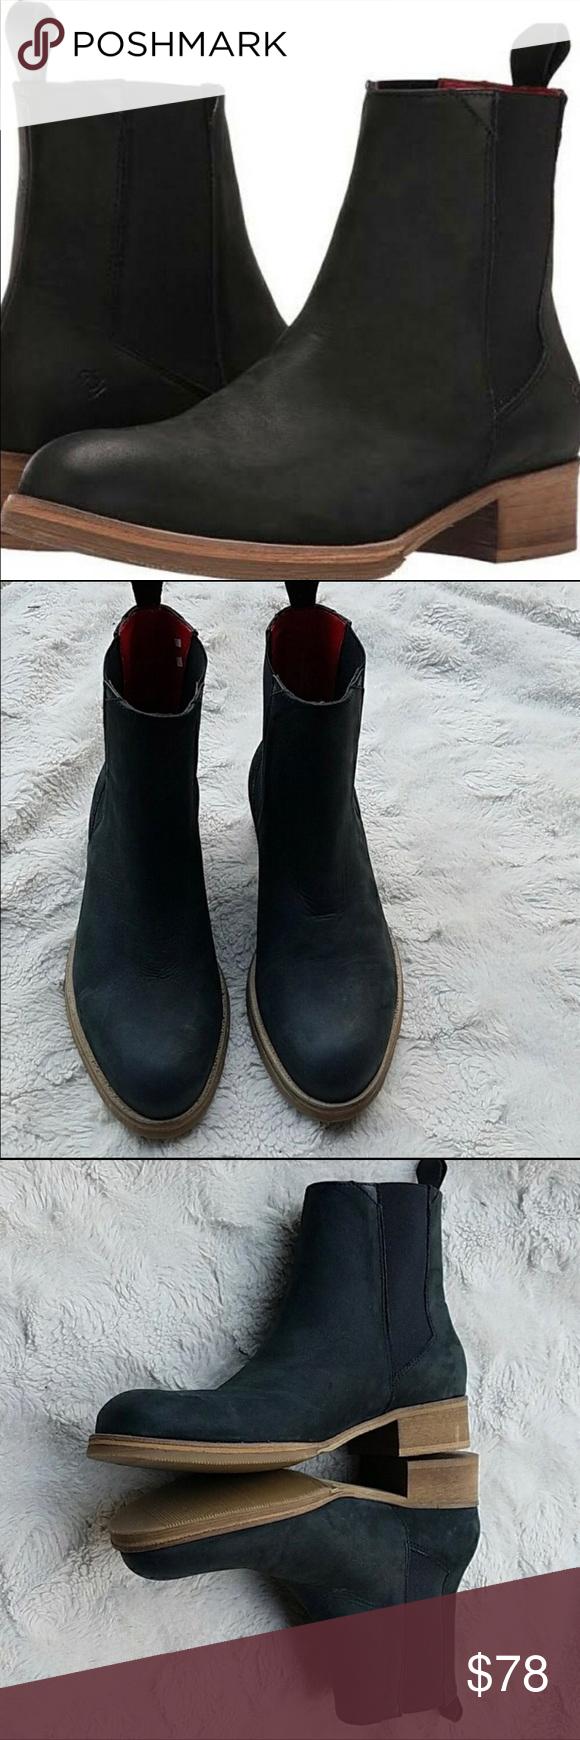 d63d04d8aa3 ⬇️PRICE DROP⬇️Liebeskind Chelsea Boots, SIZE 8 Liebeskind ...